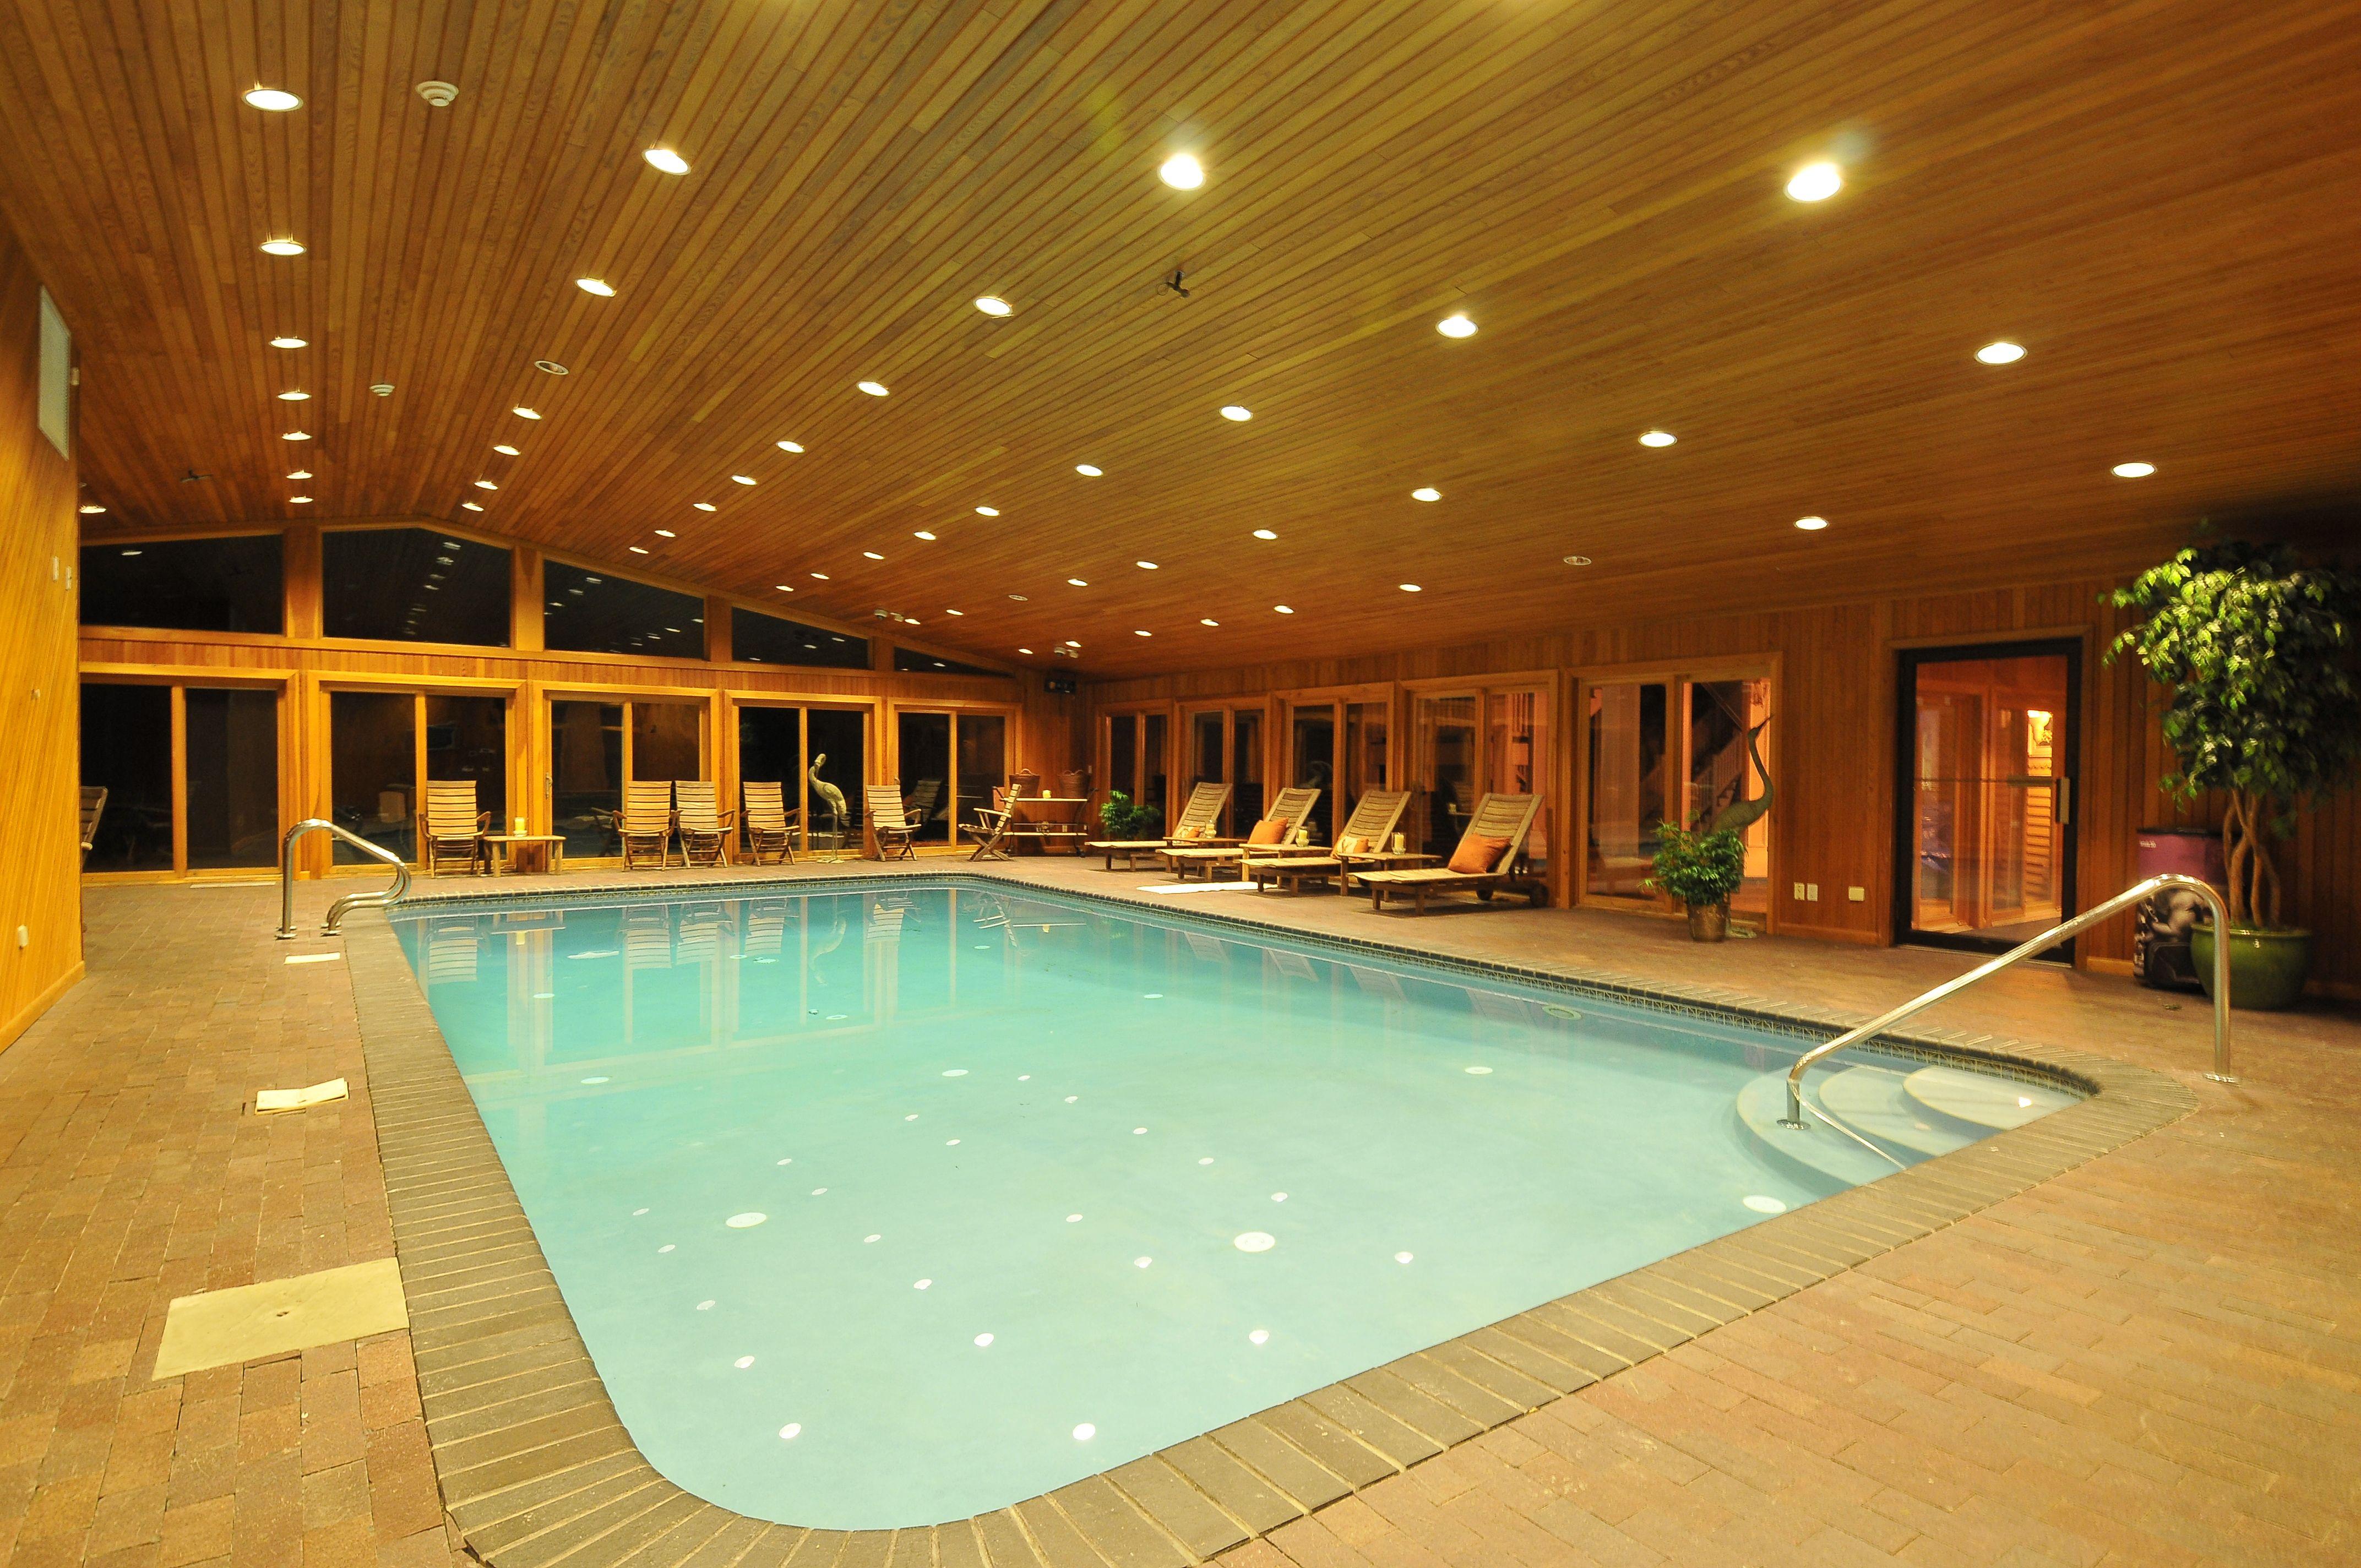 HOME OF RAP STAR 50 CENT | Farmington, CT | Luxury Portfolio ...